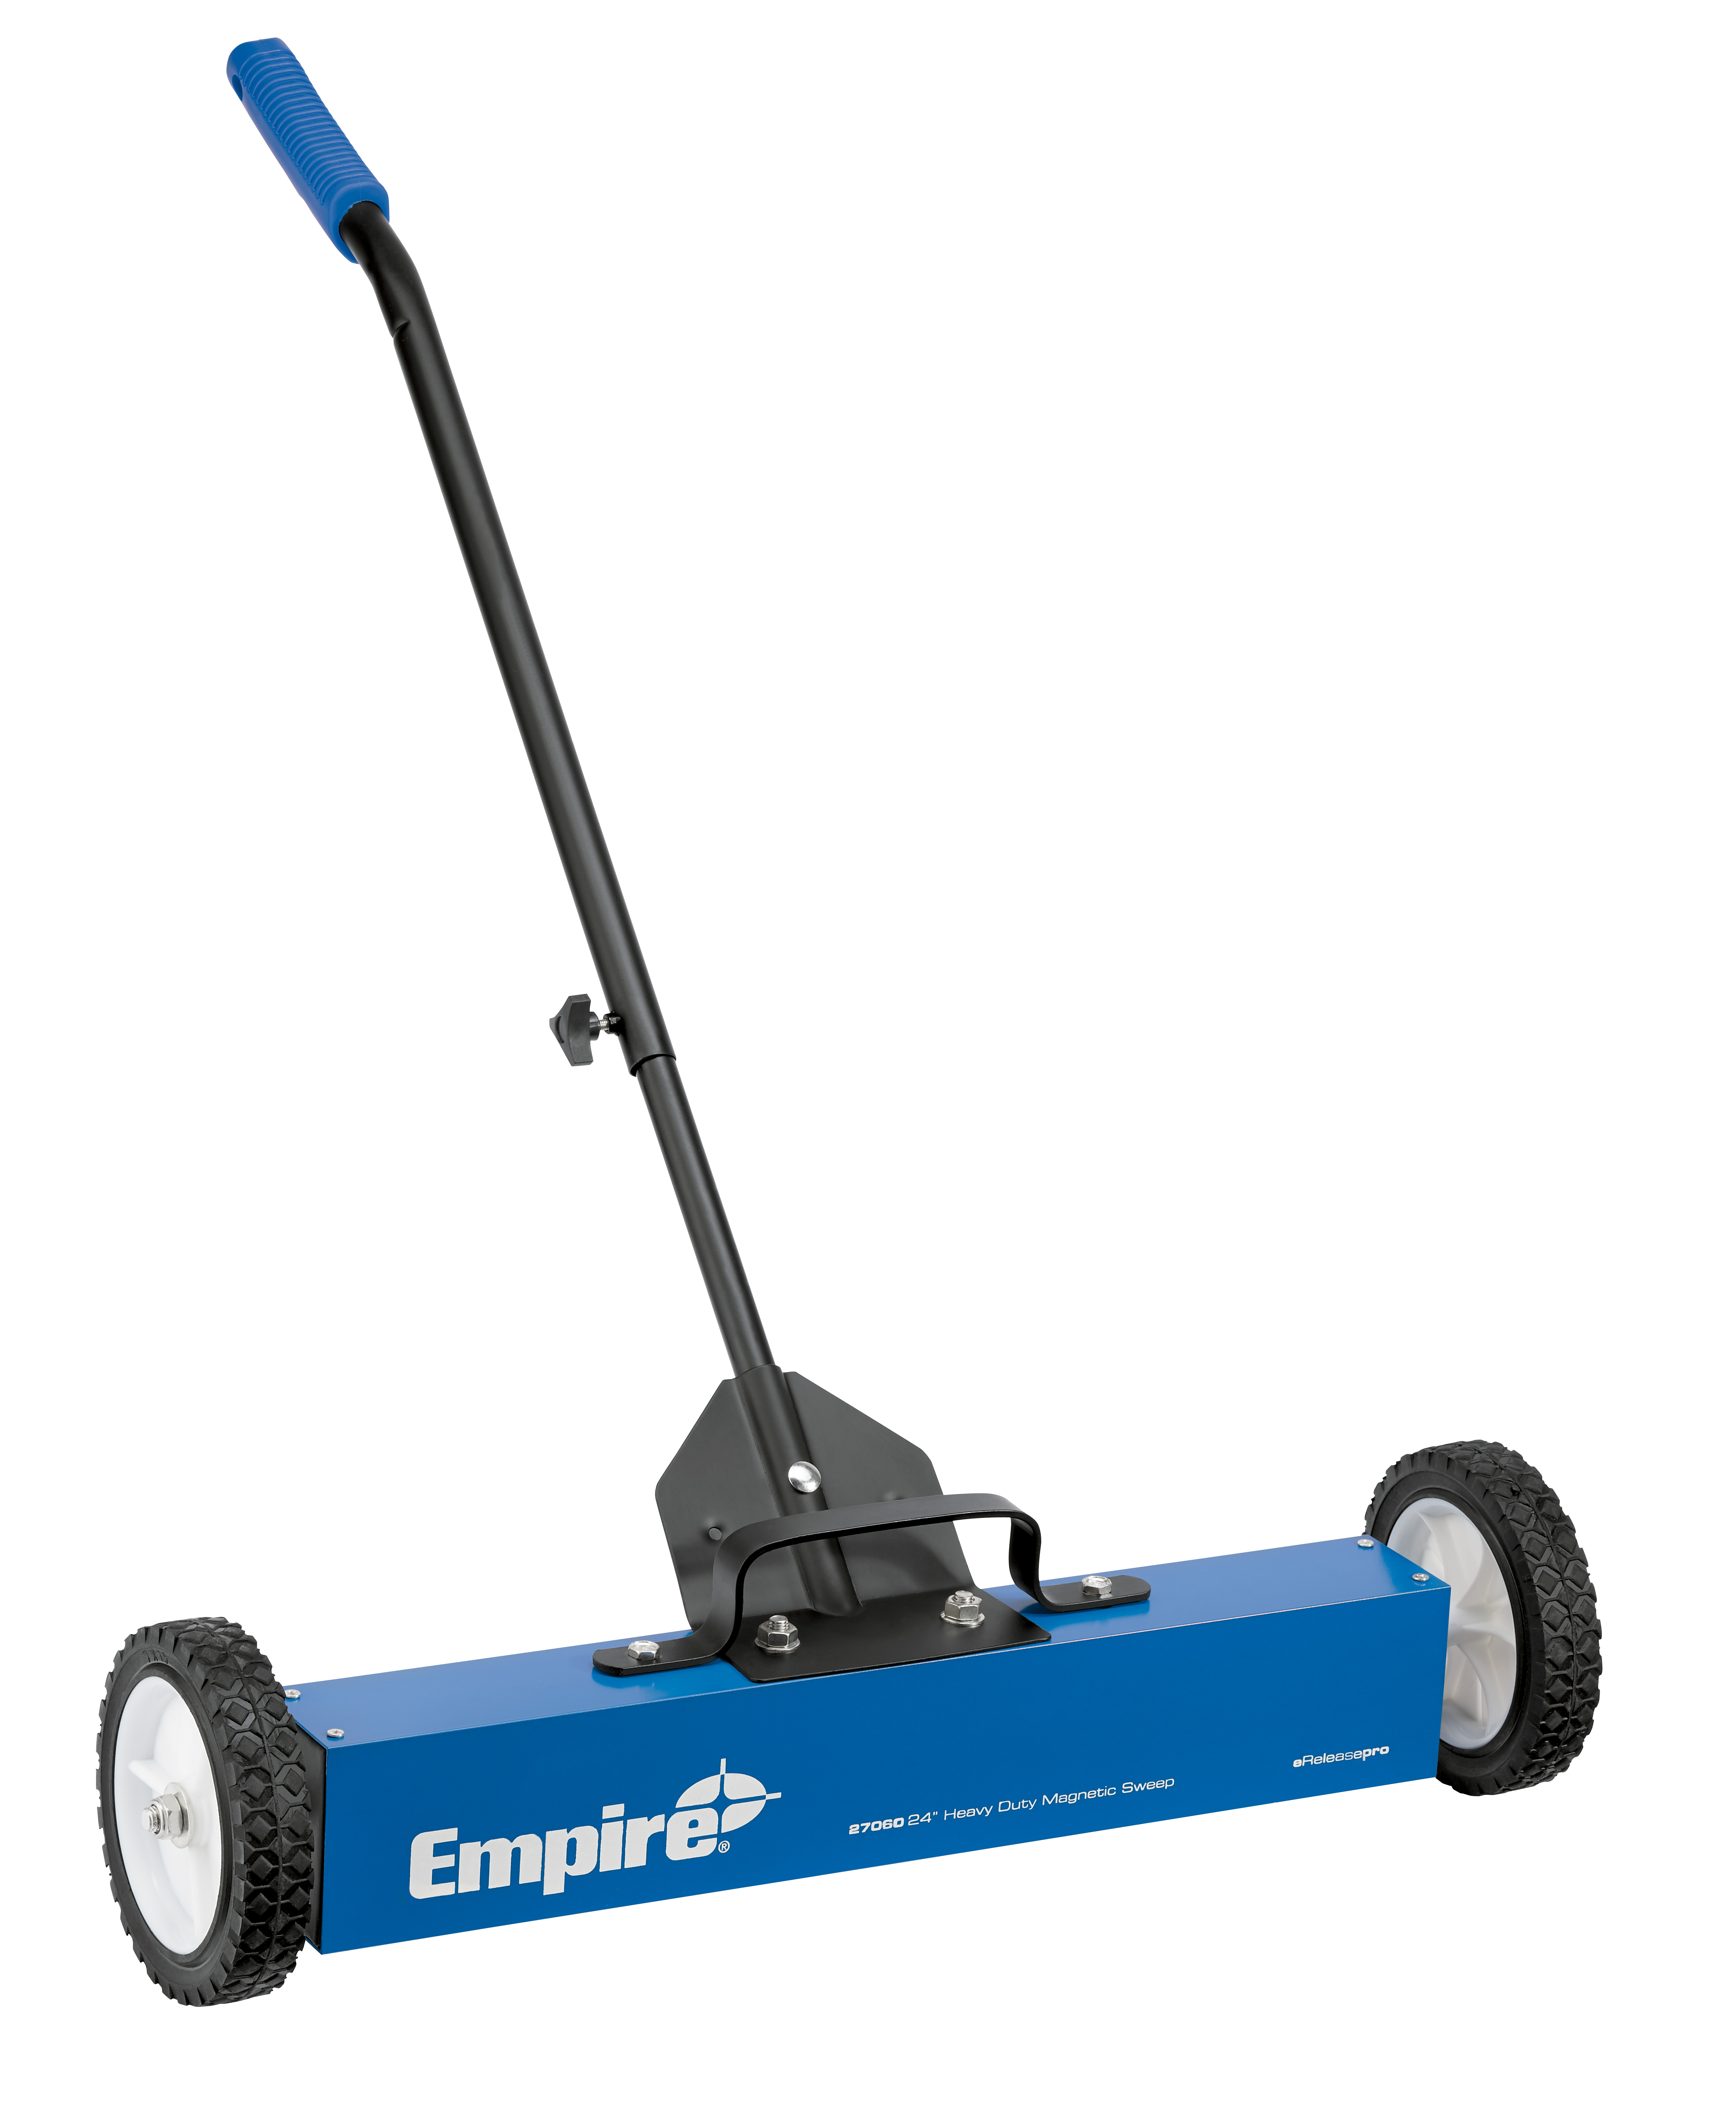 Milwaukee® Empire® 27060 Heavy Duty Magnetic Sweeper, 30 lb, Aluminum Housing